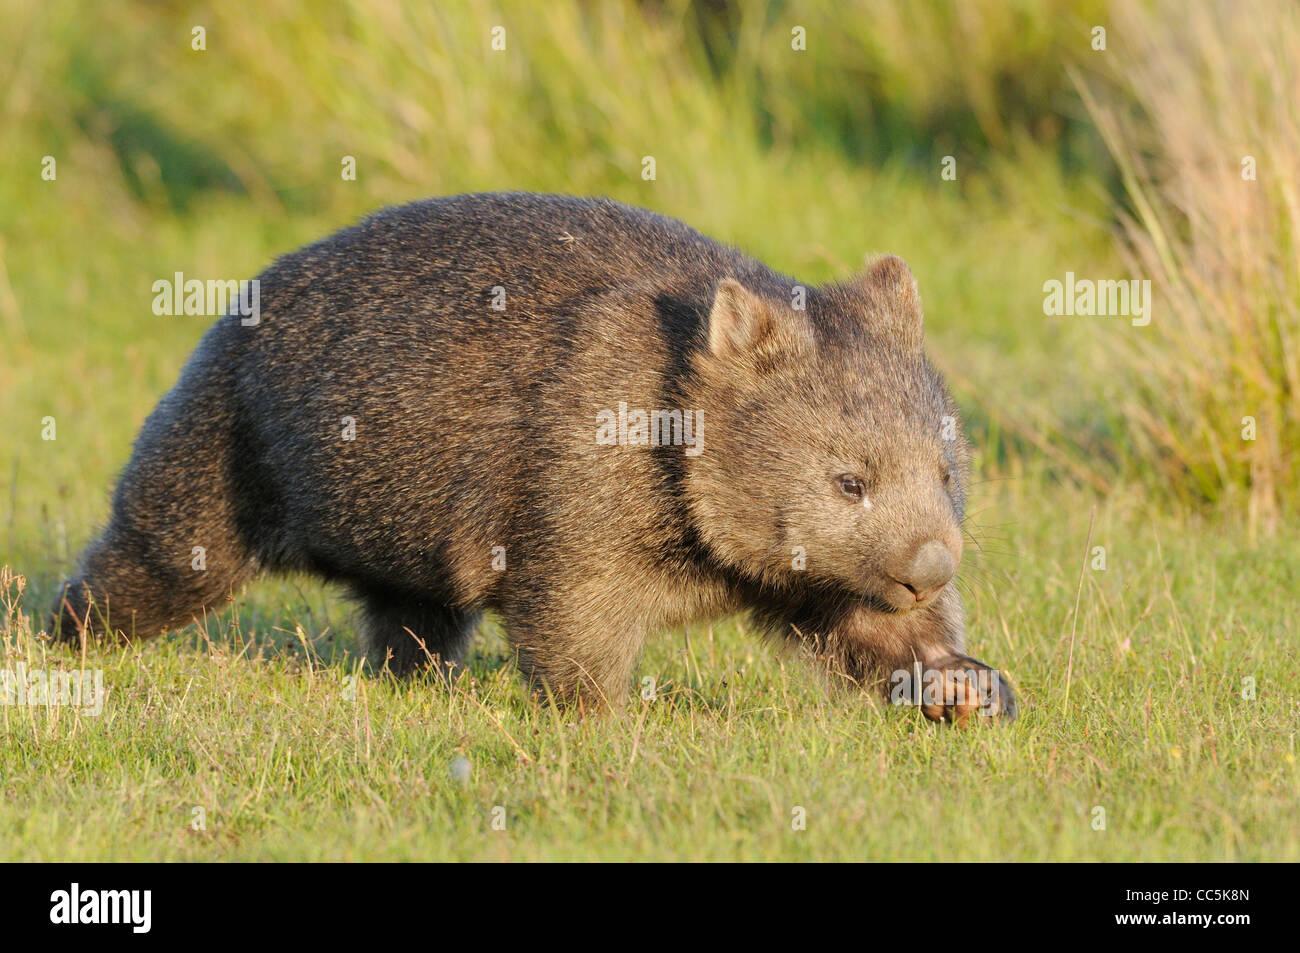 Common Wombat Vombatus ursinus Photographed in Tasmania Stock Photo